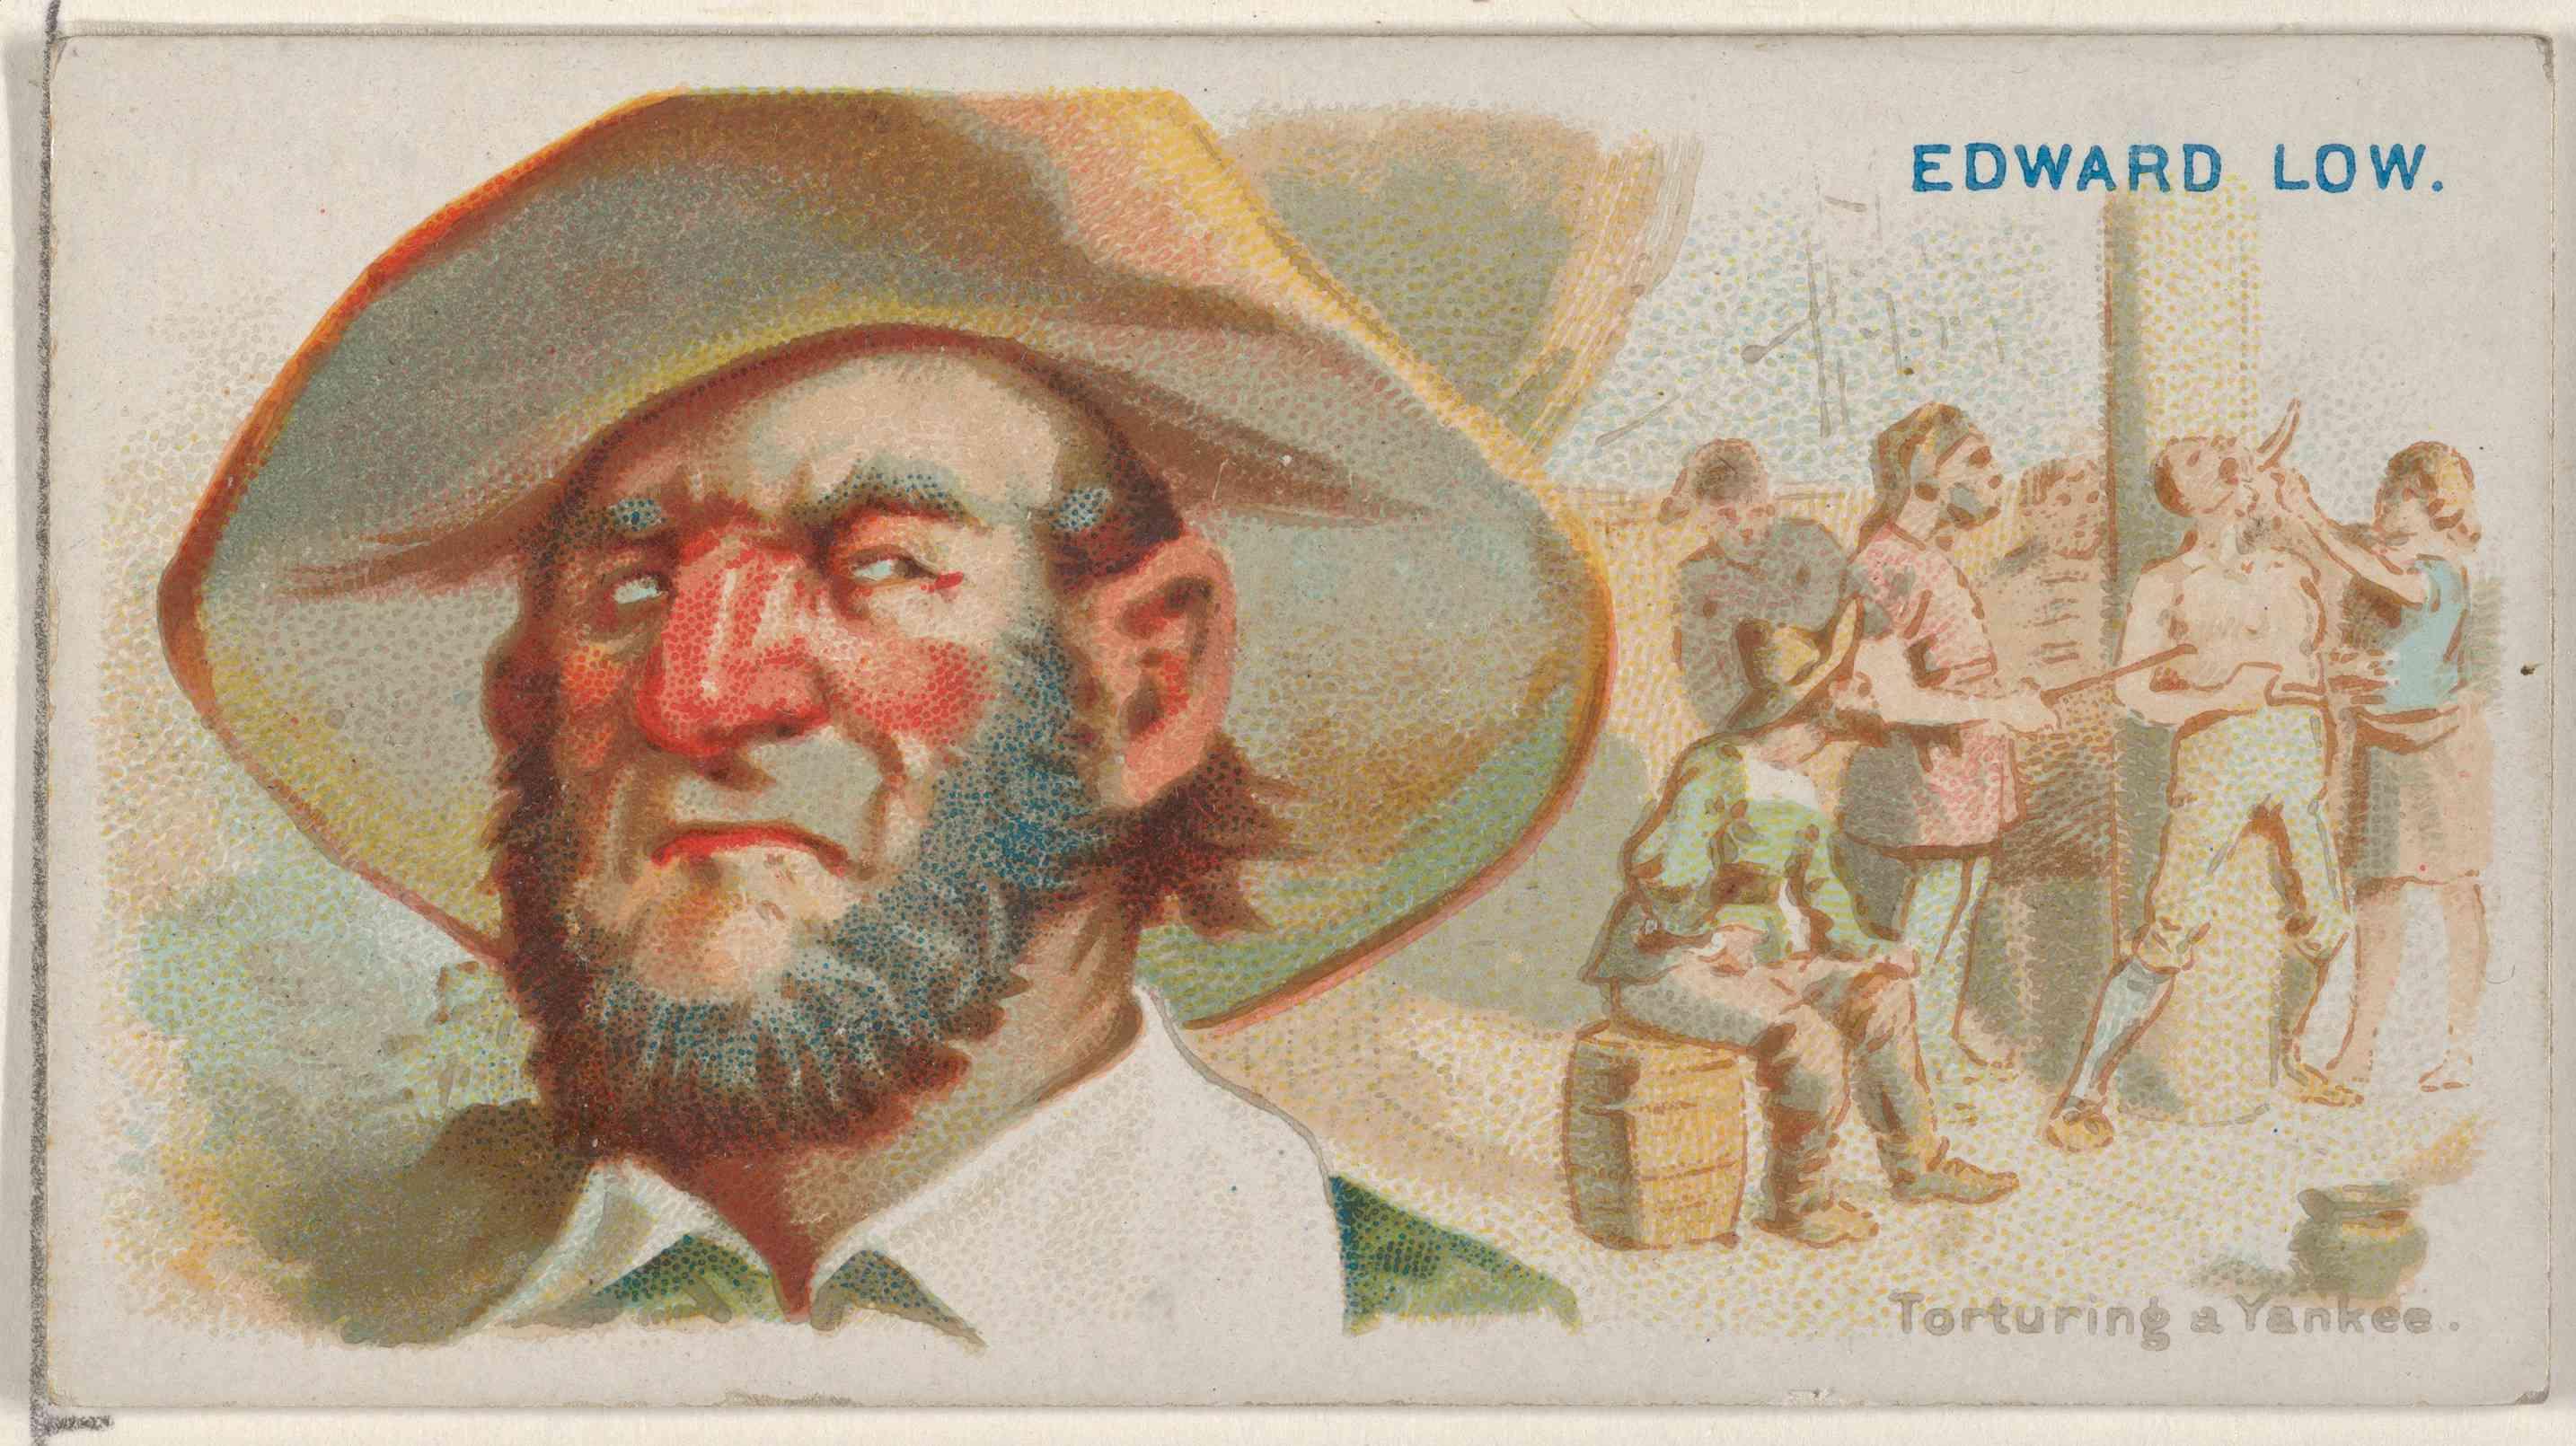 Pirate Edward Low